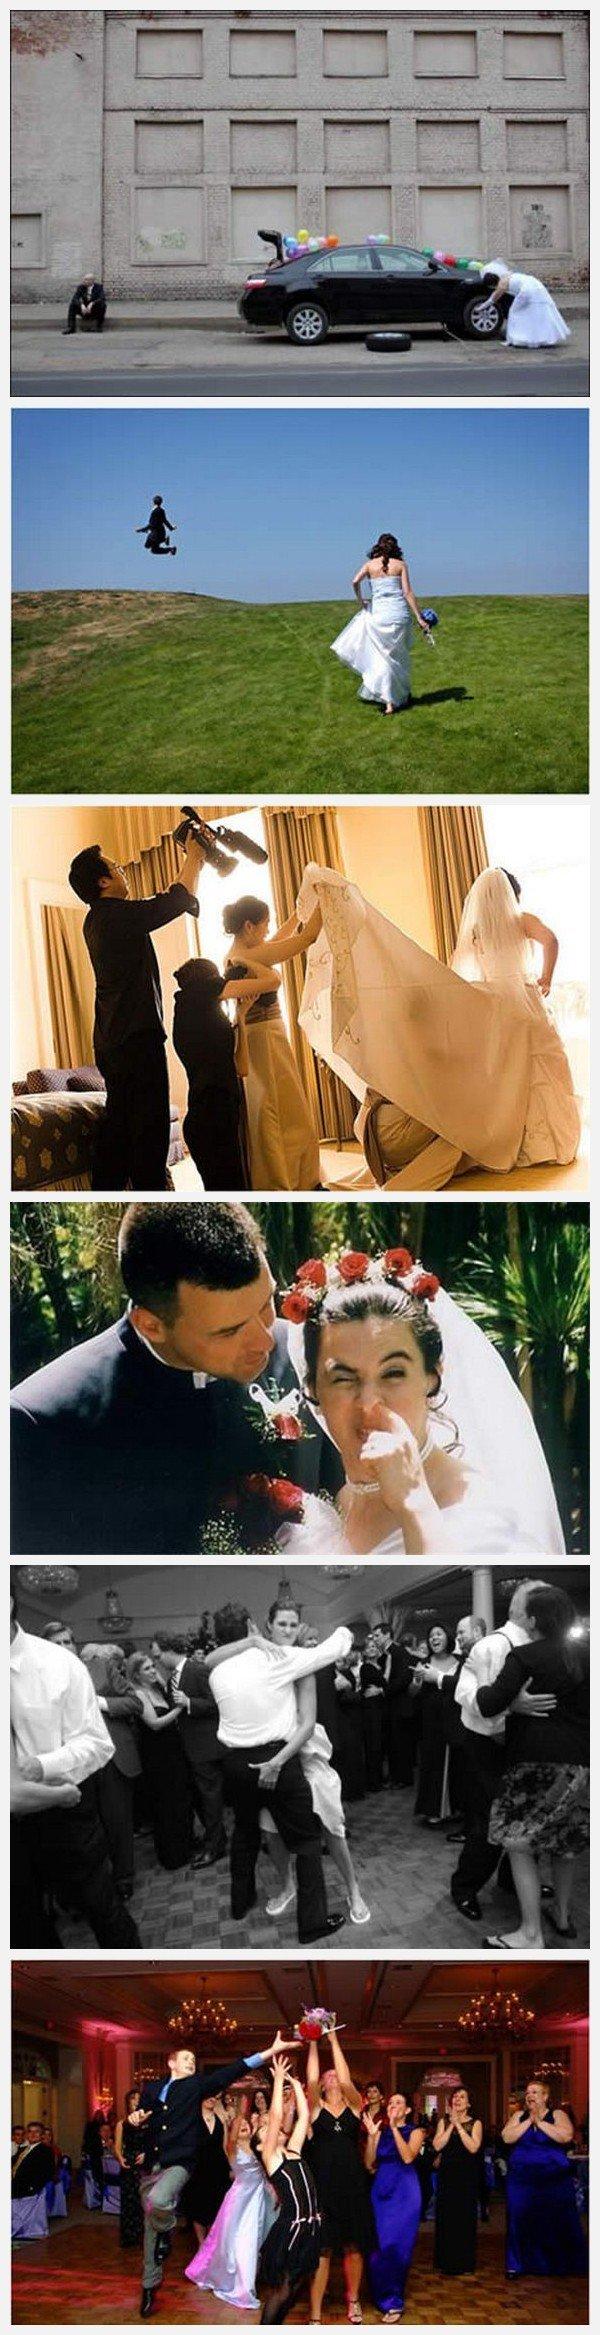 Wedding Photo fail pt2. Wedding photo fail pt 1 funnyjunk.com/funny_pictures/1990731/Wedding+Photo+fail/.